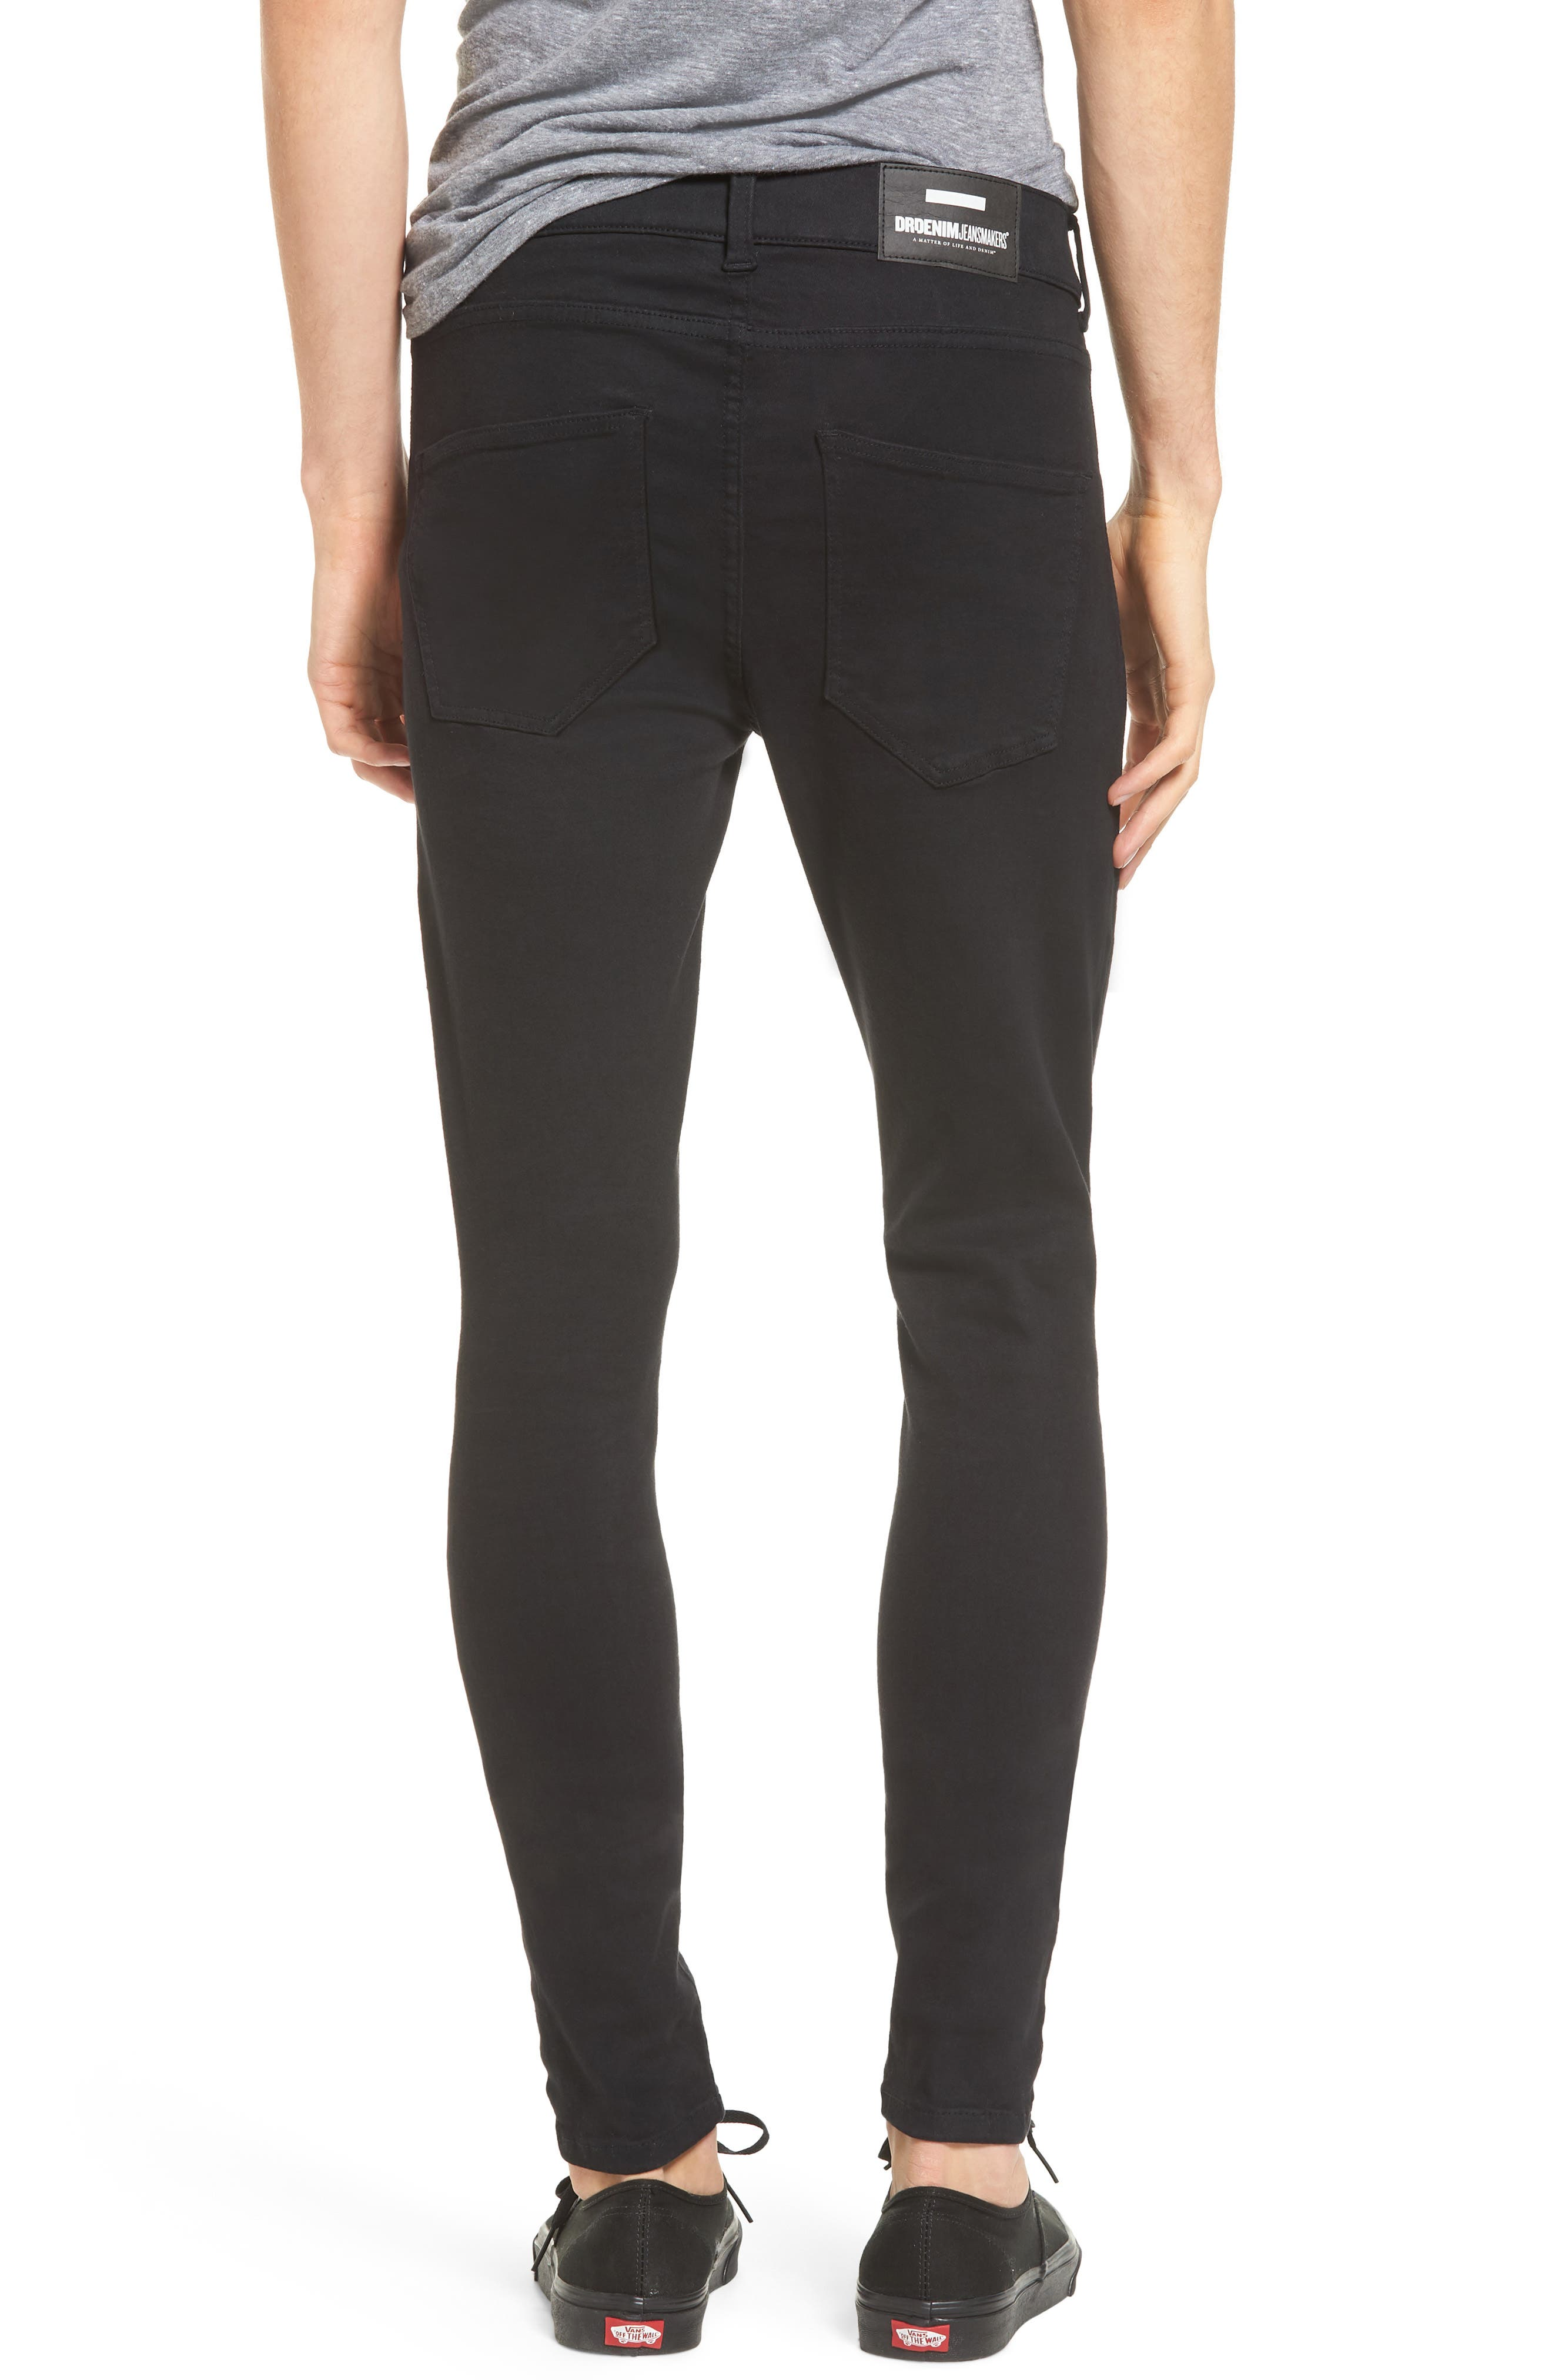 Leroy Slim Fit Jeans,                             Alternate thumbnail 2, color,                             Black Ripped Knees